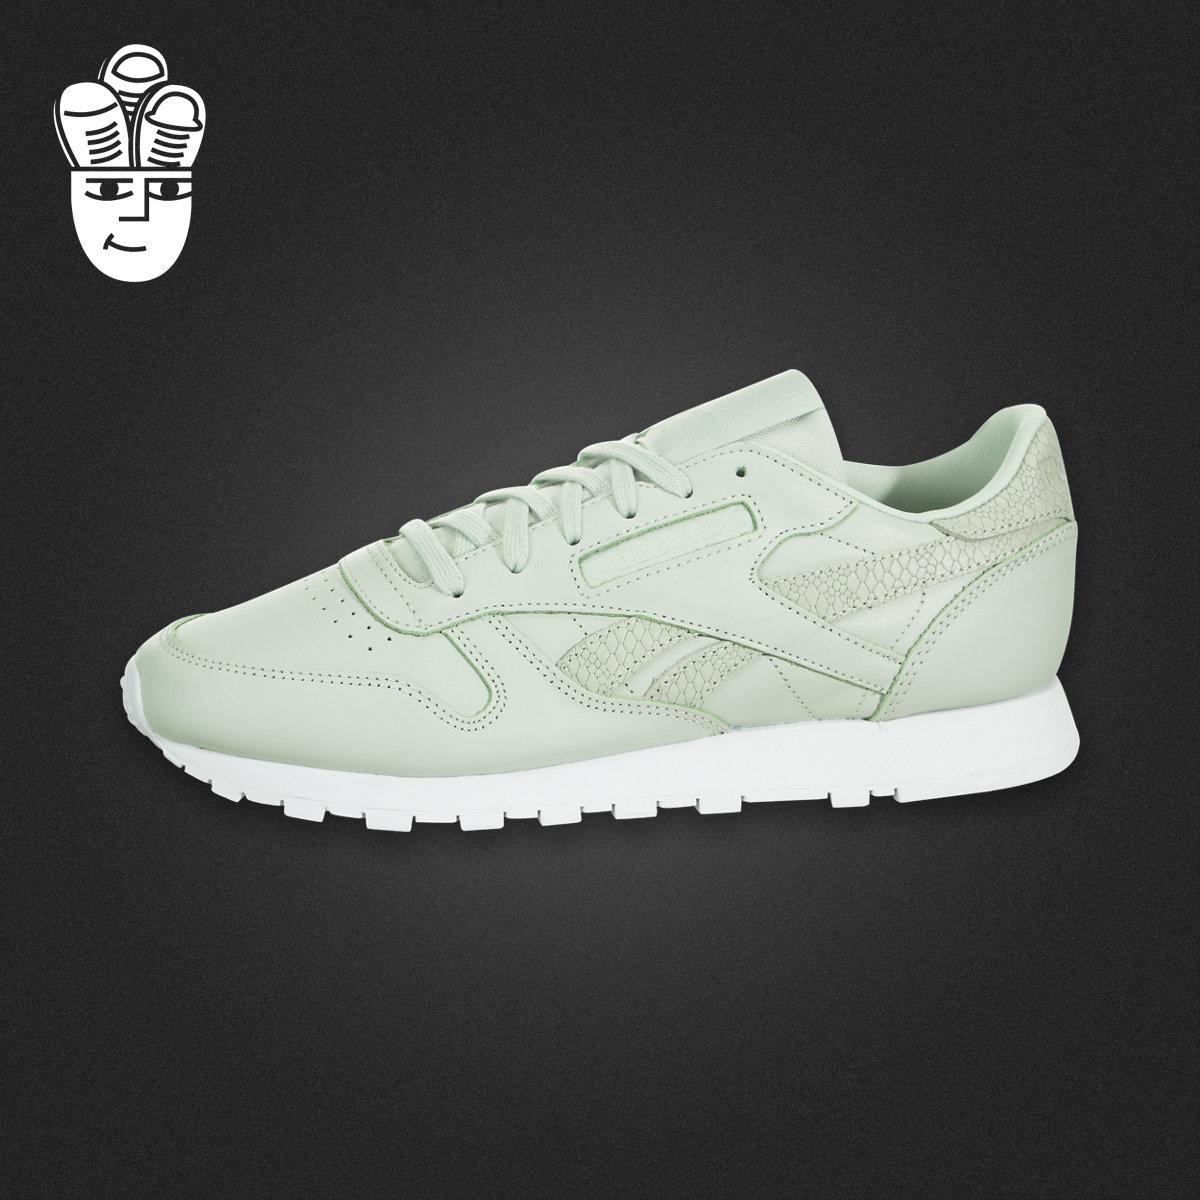 Reebok Classic Leather Pastel 锐步女鞋 复古跑步鞋 运动休闲鞋